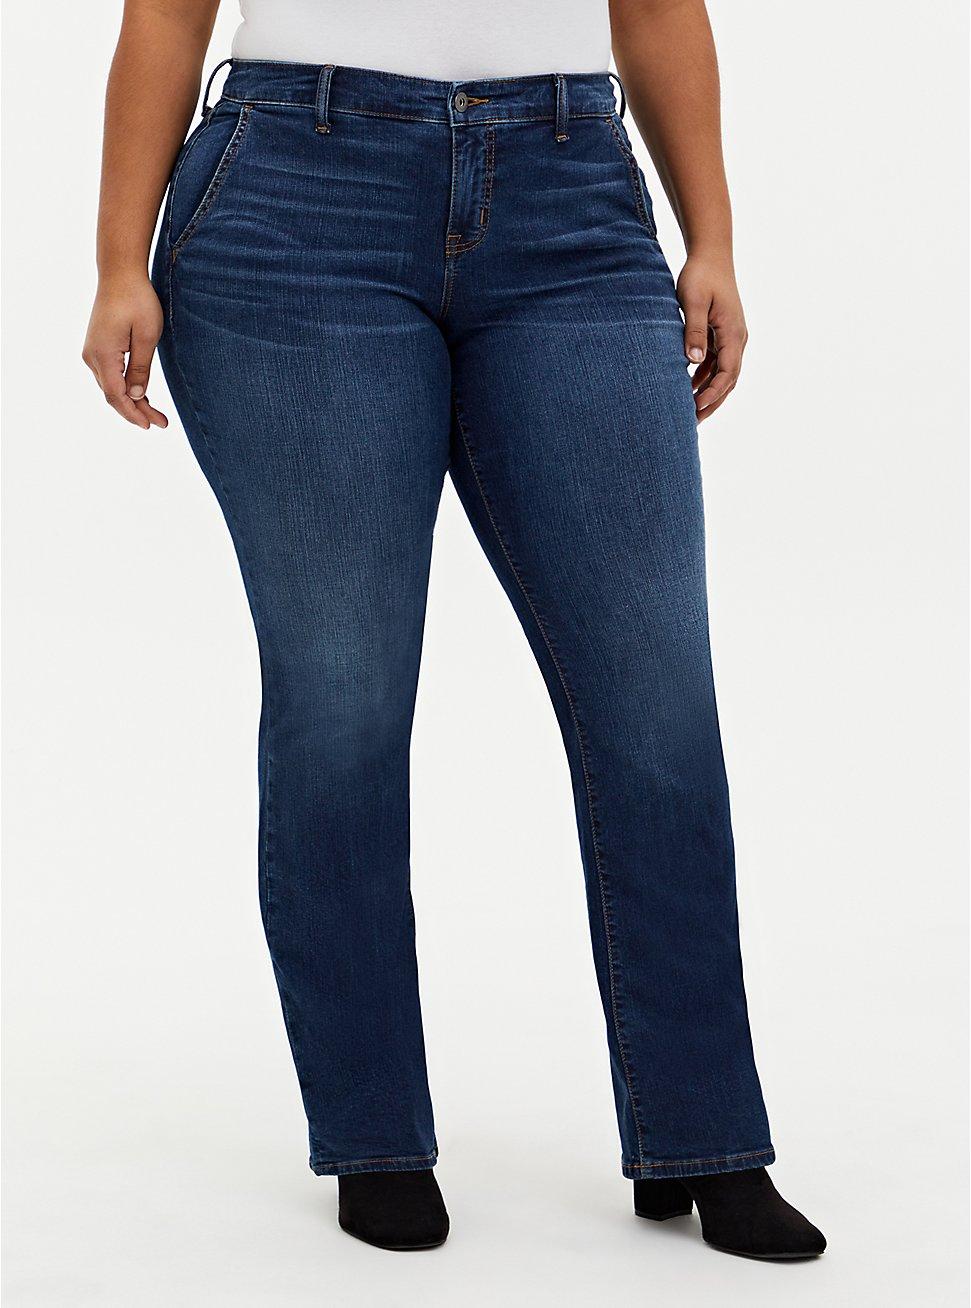 Mid Rise Slim Boot Jean - Vintage Stretch Medium Wash, UNDERCOVER, hi-res